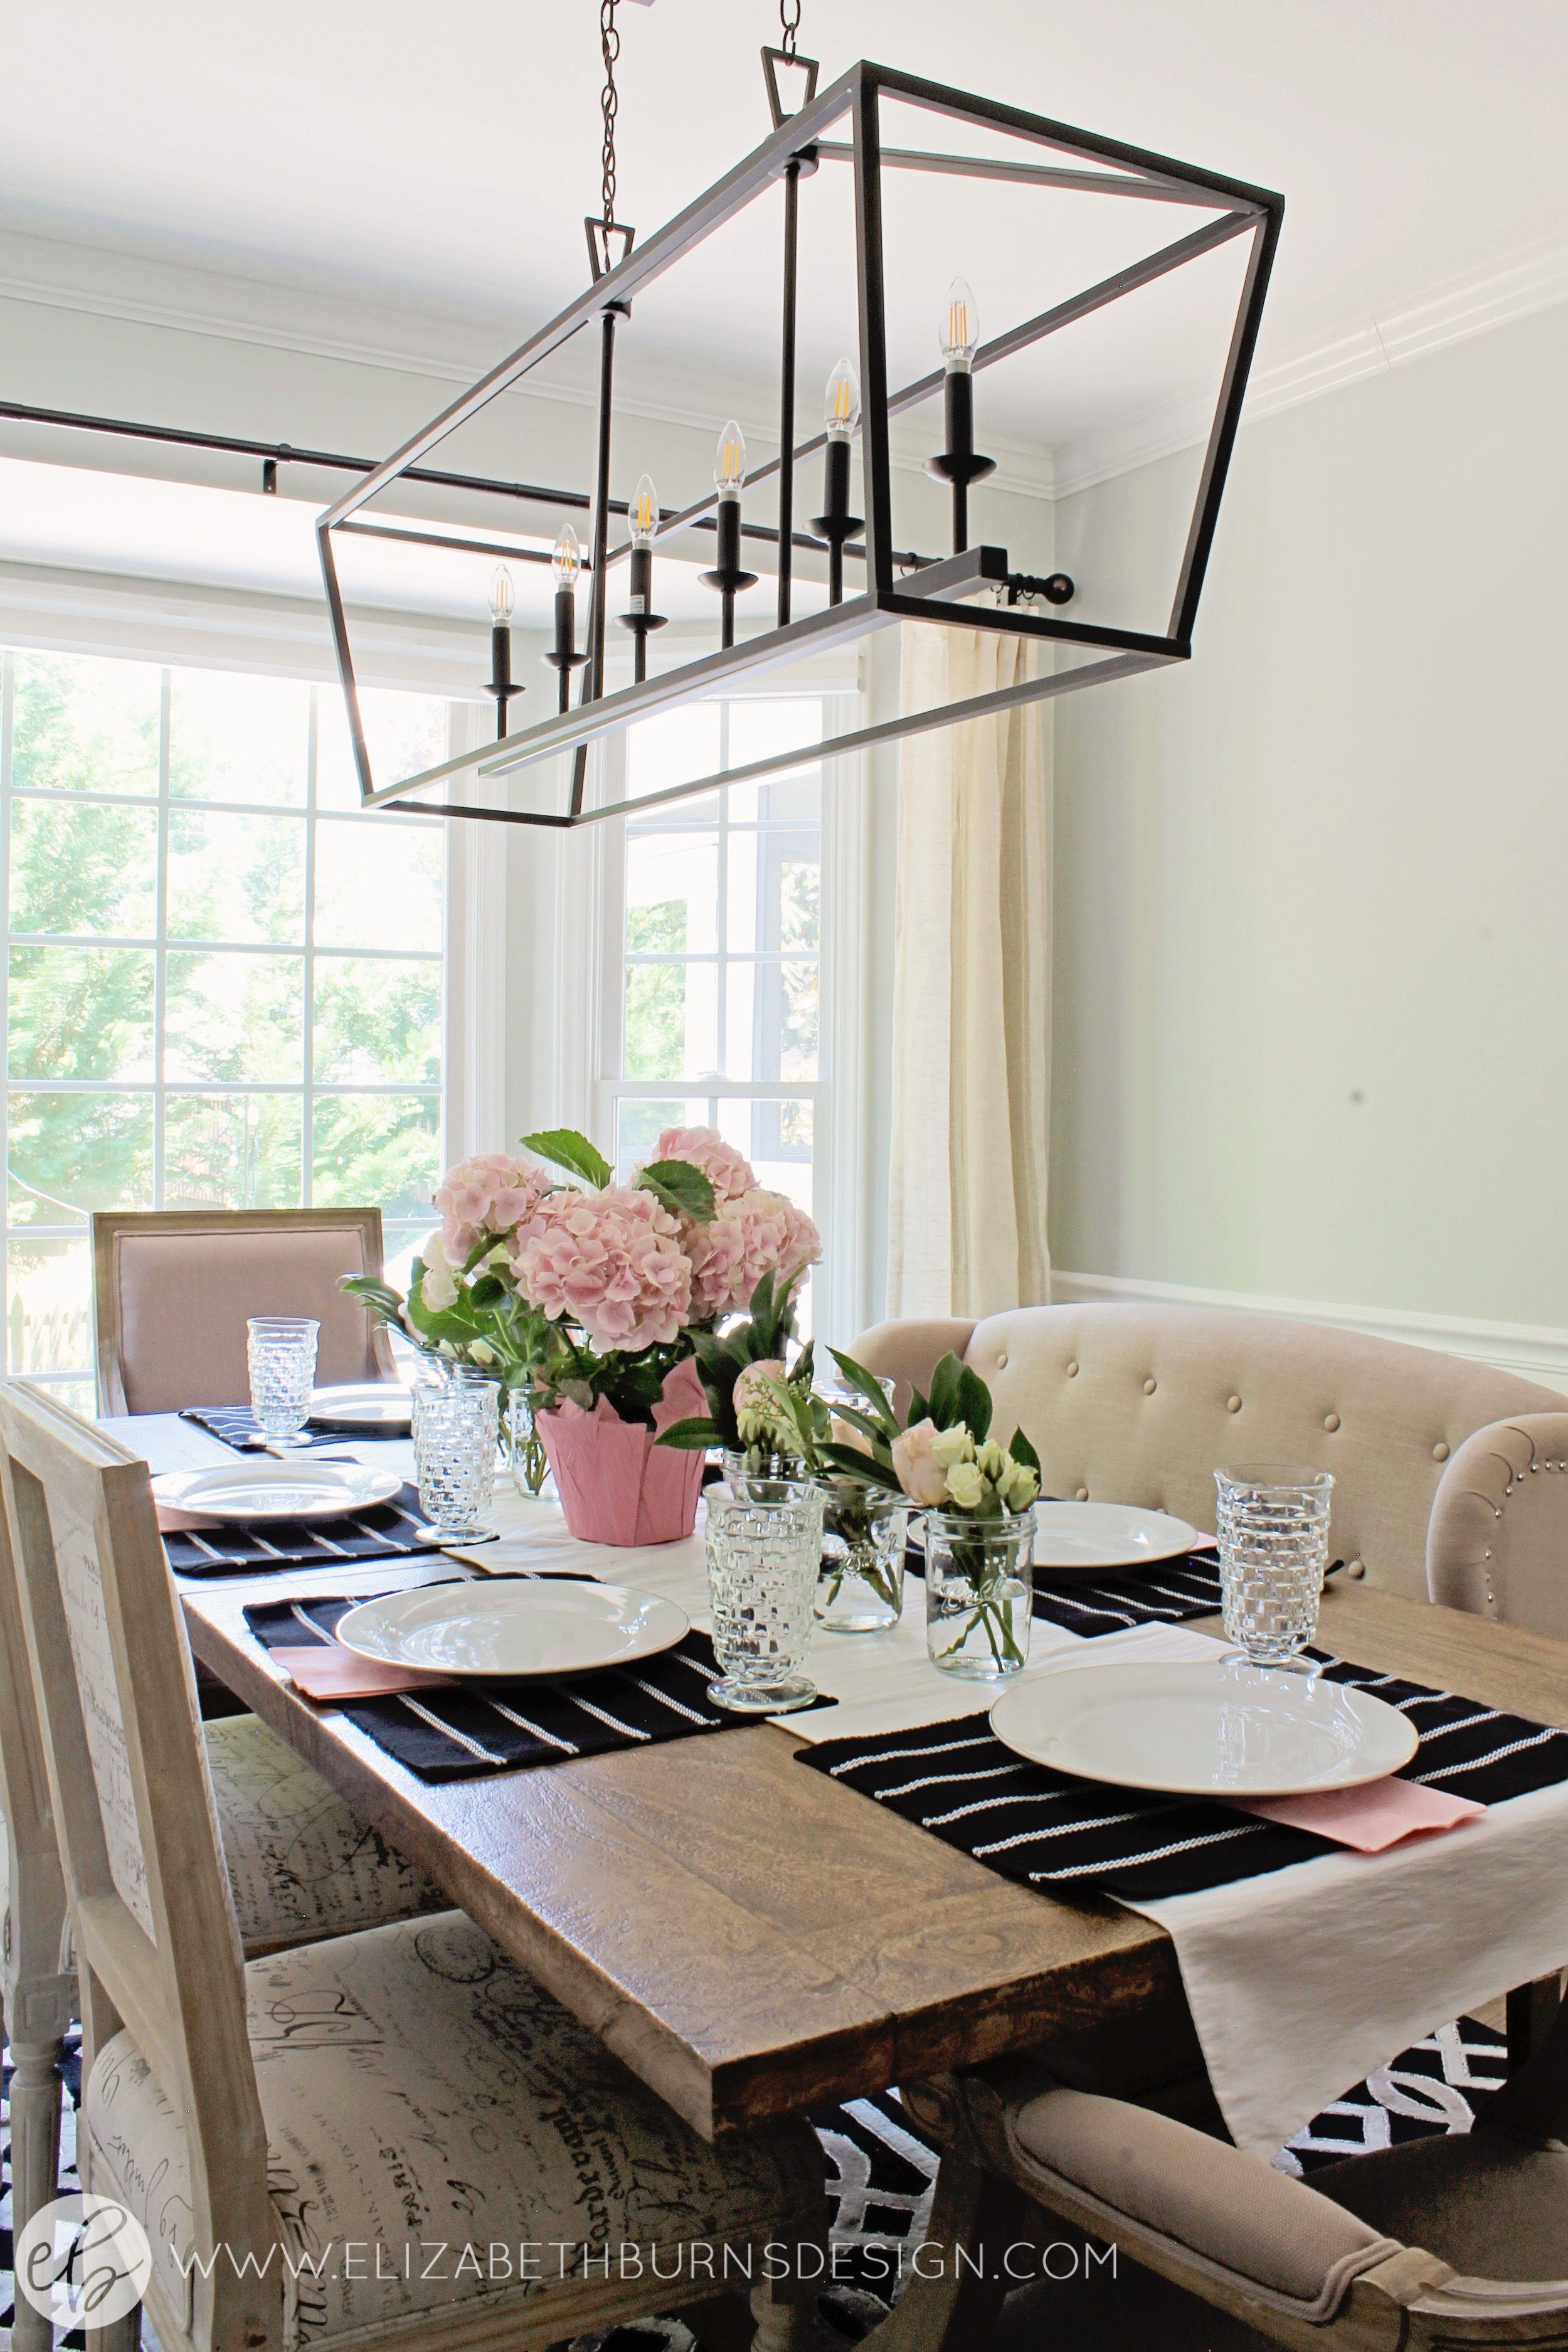 Elizabeth Burns Design - Budget Farmhouse Small Dining Room Sherwin Williams Silver Strand Trestle Table Linen Chairs DIY Wainscoting Dark Walnut Oak Floor (6).jpg